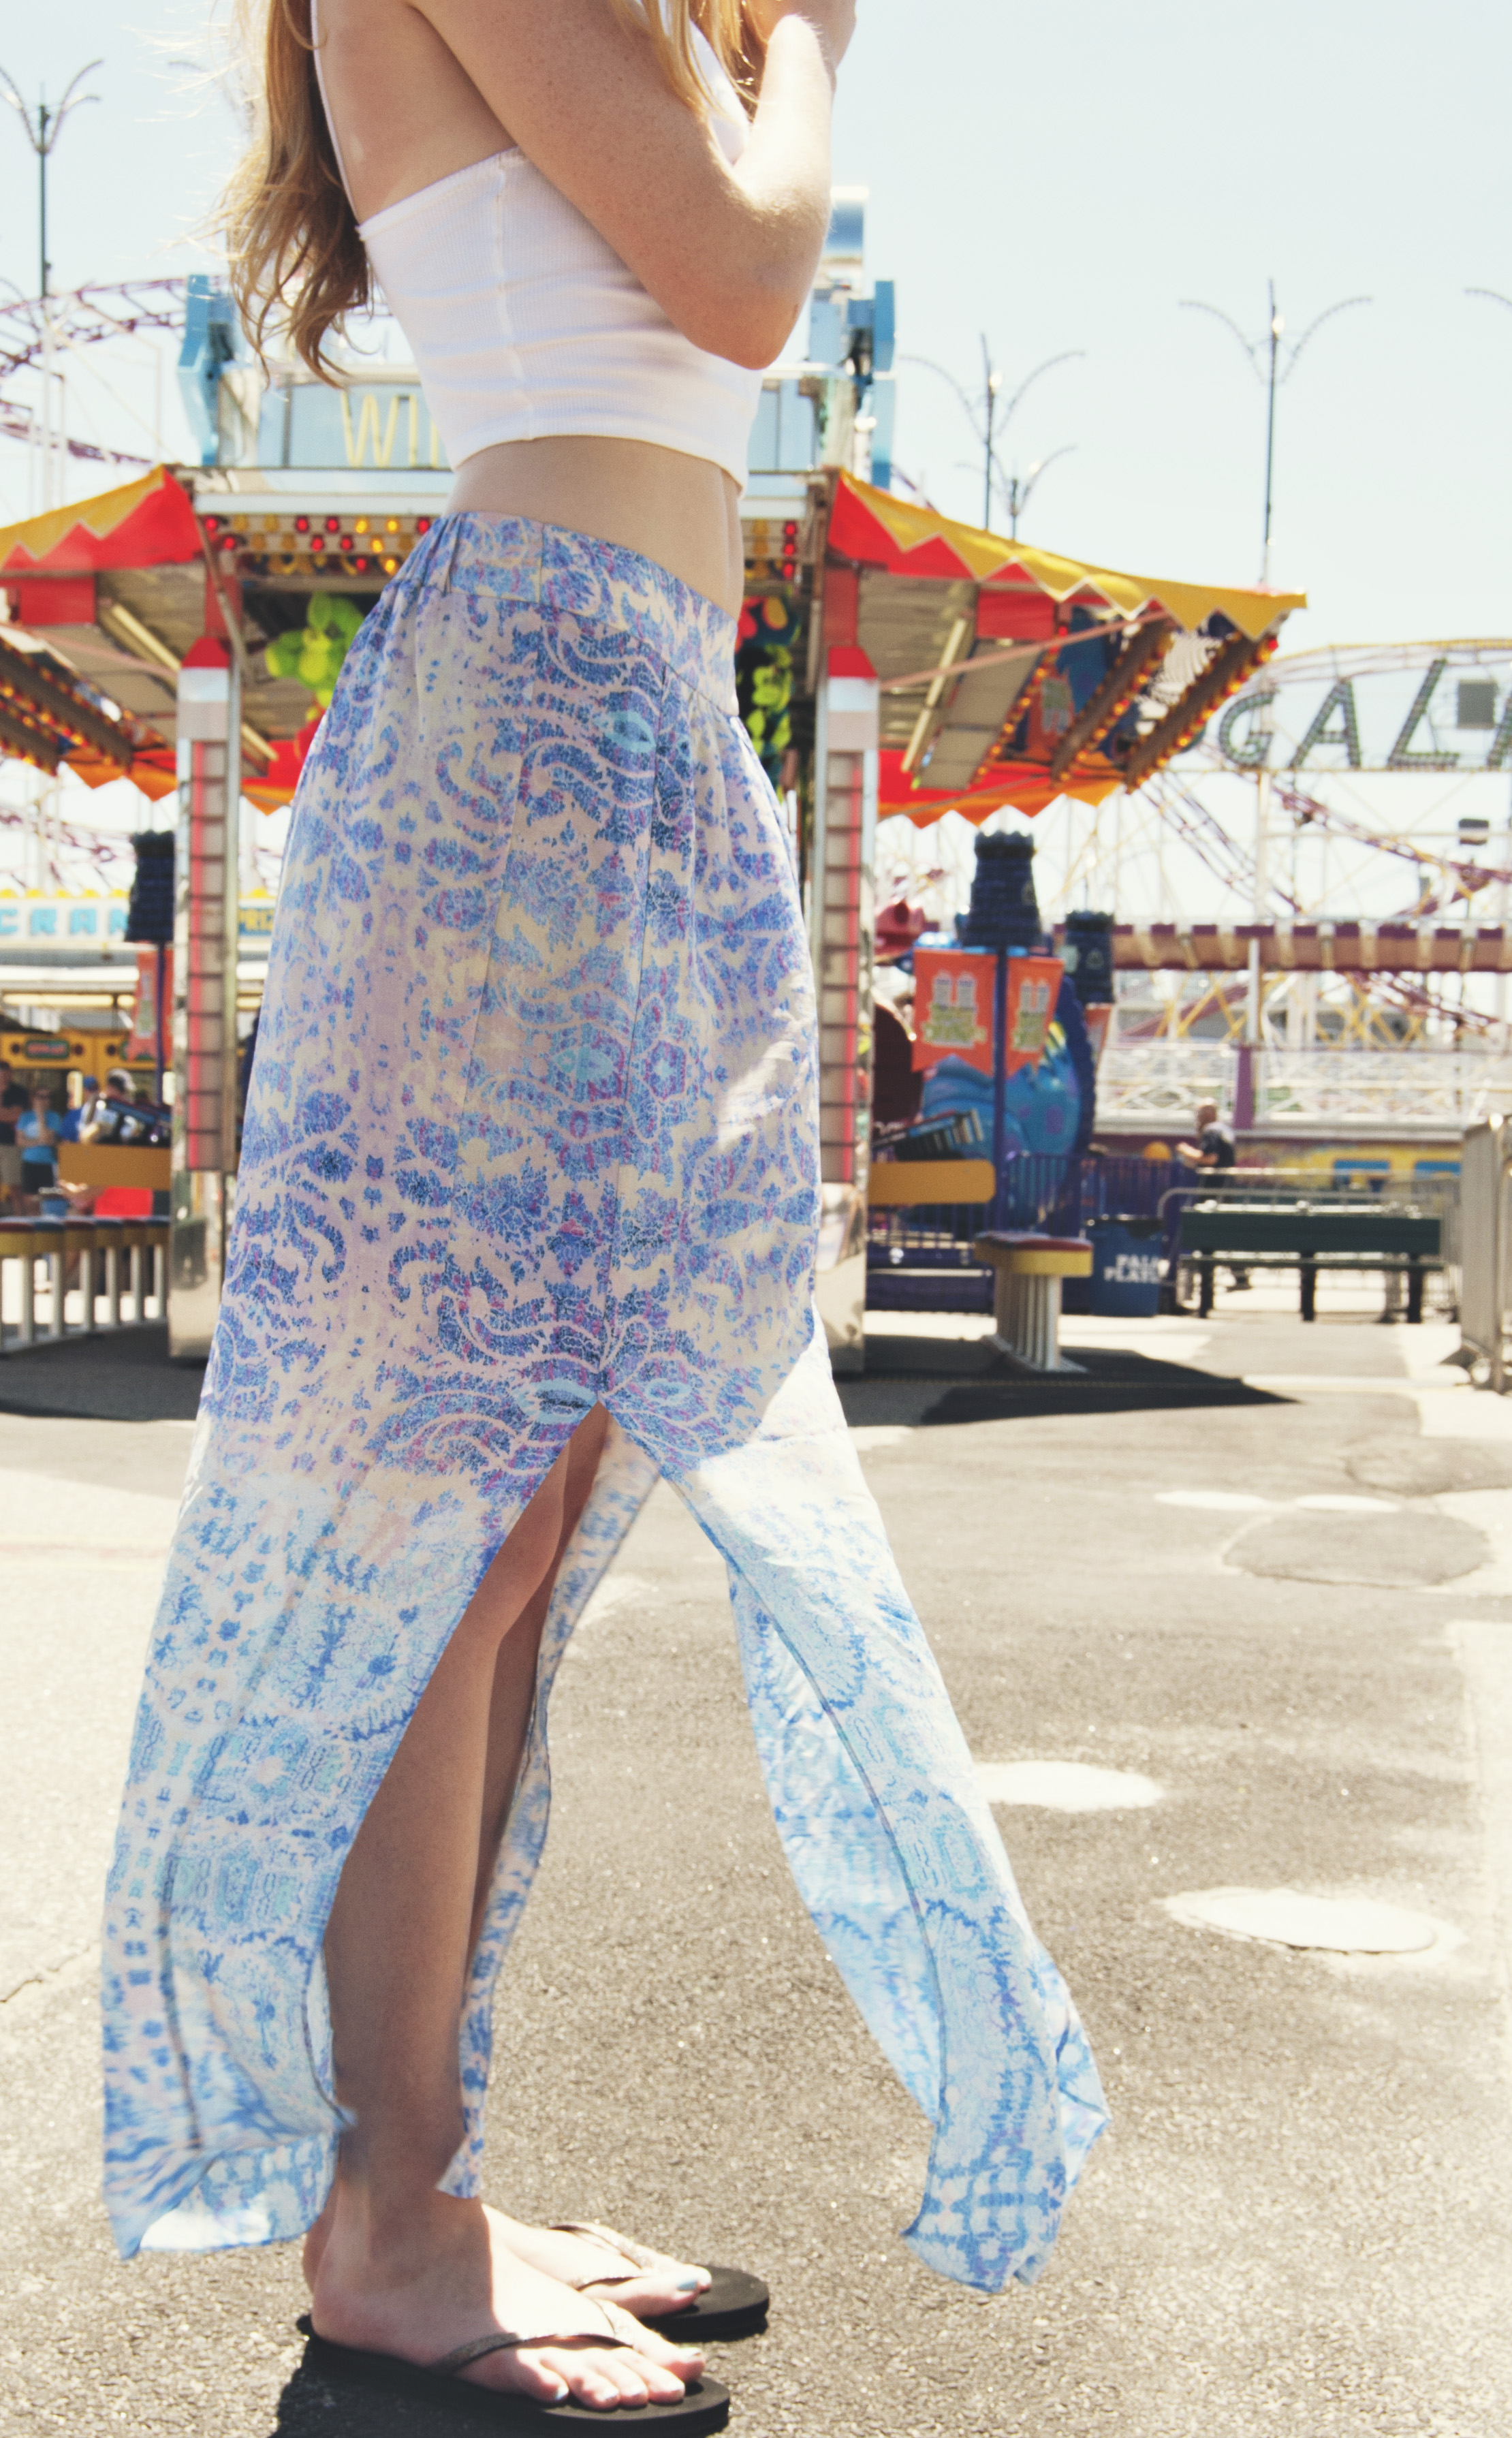 Cropped Top & Maxi Skirt (via Girl x Garment)